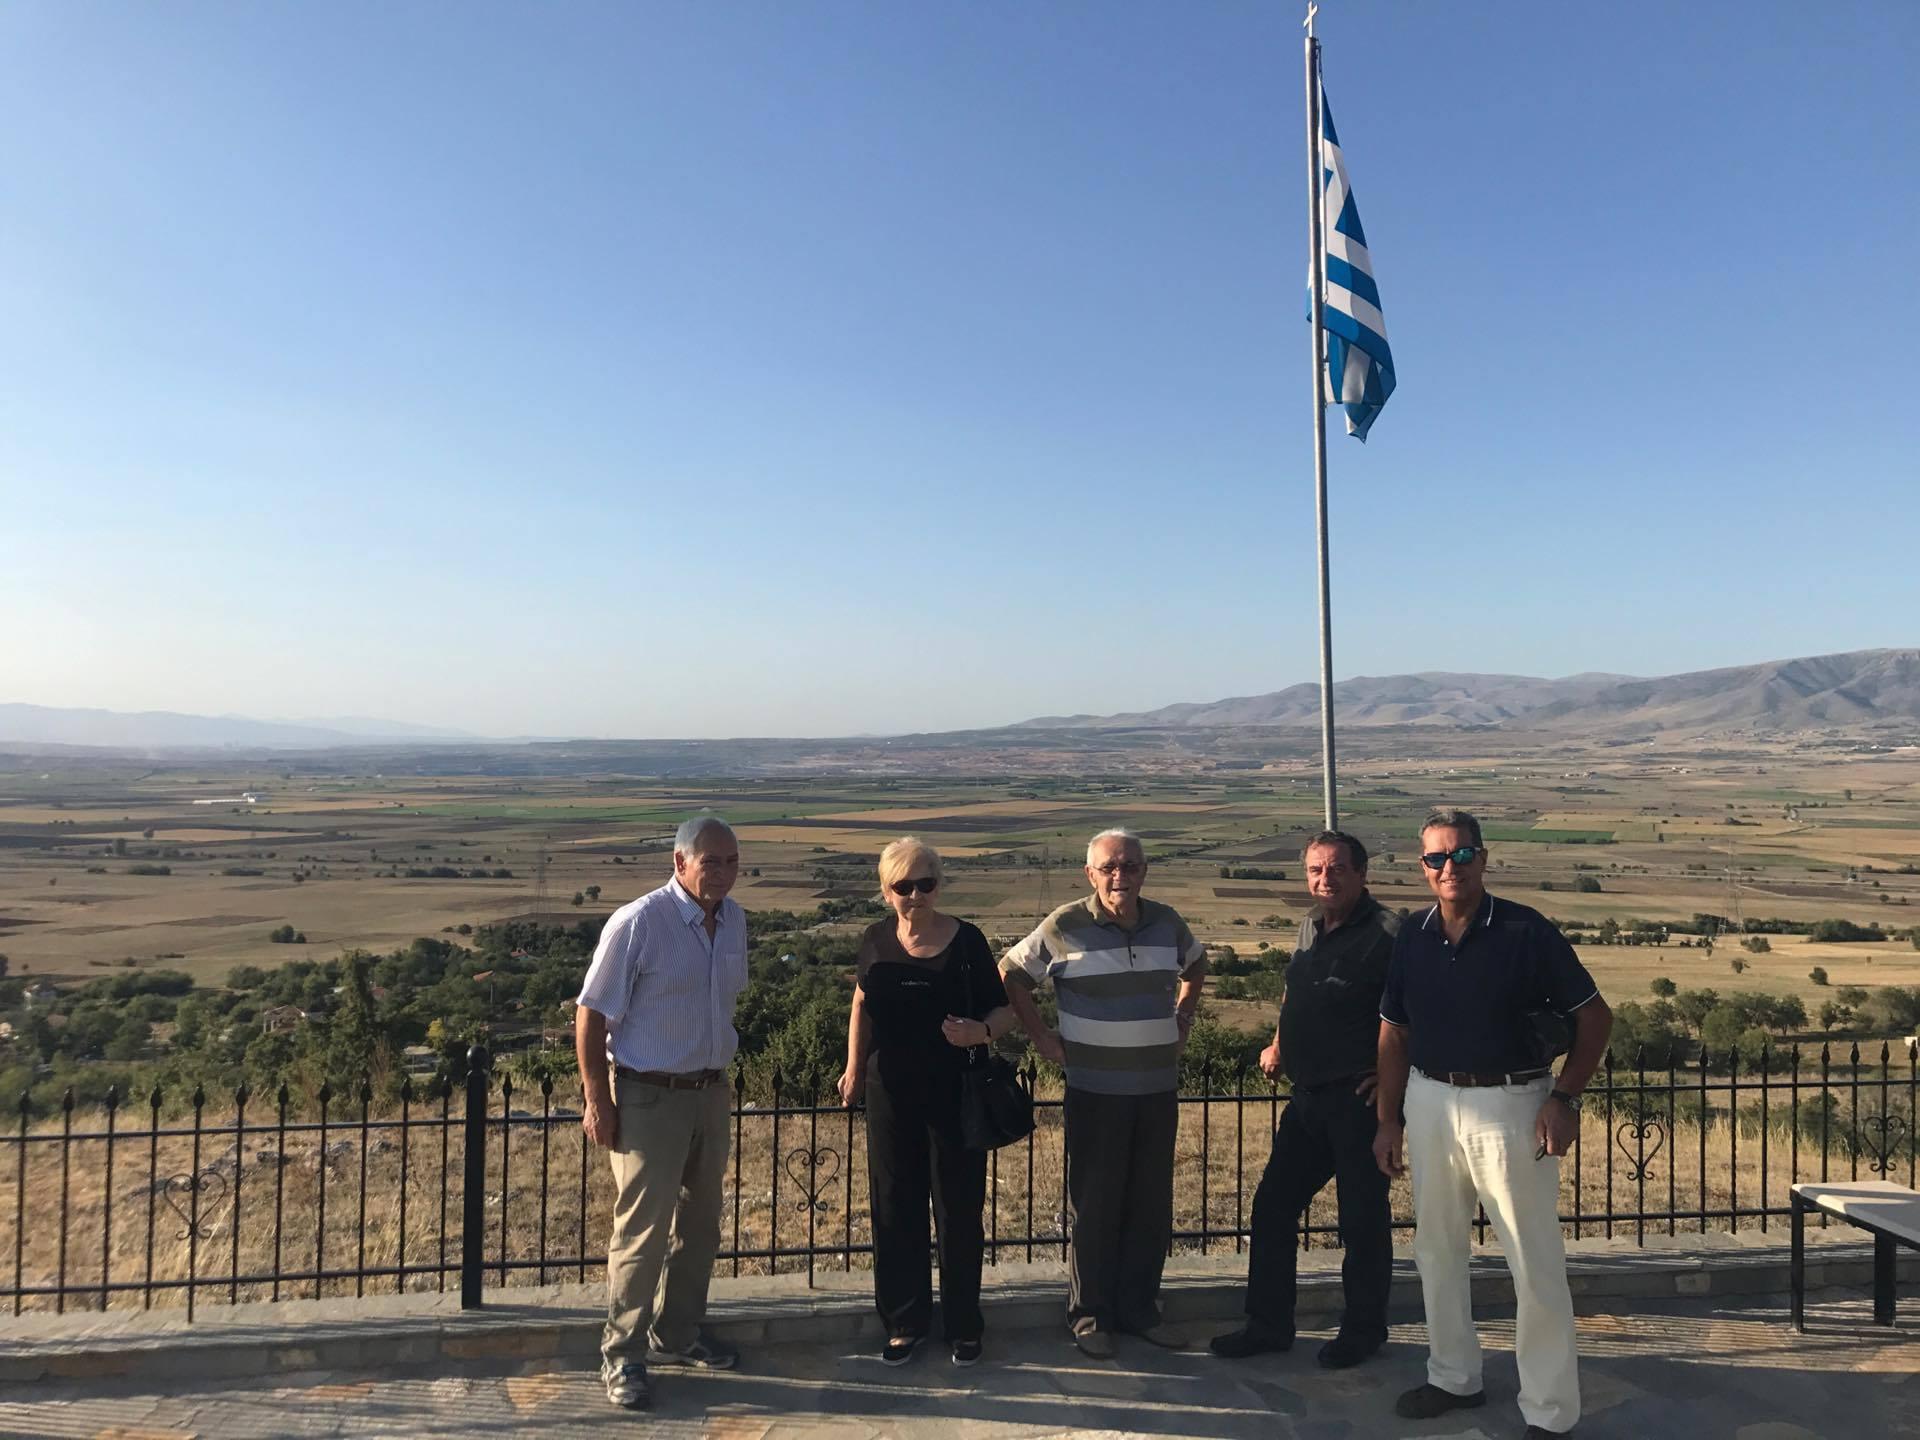 kozan.gr: Ο εορτασμός της Υψώσεως του Τιμίου Σταυρού στο λόφο του οικισμού Γαλανίου στο Δρέπανο Κοζάνης (Φωτογραφίες)